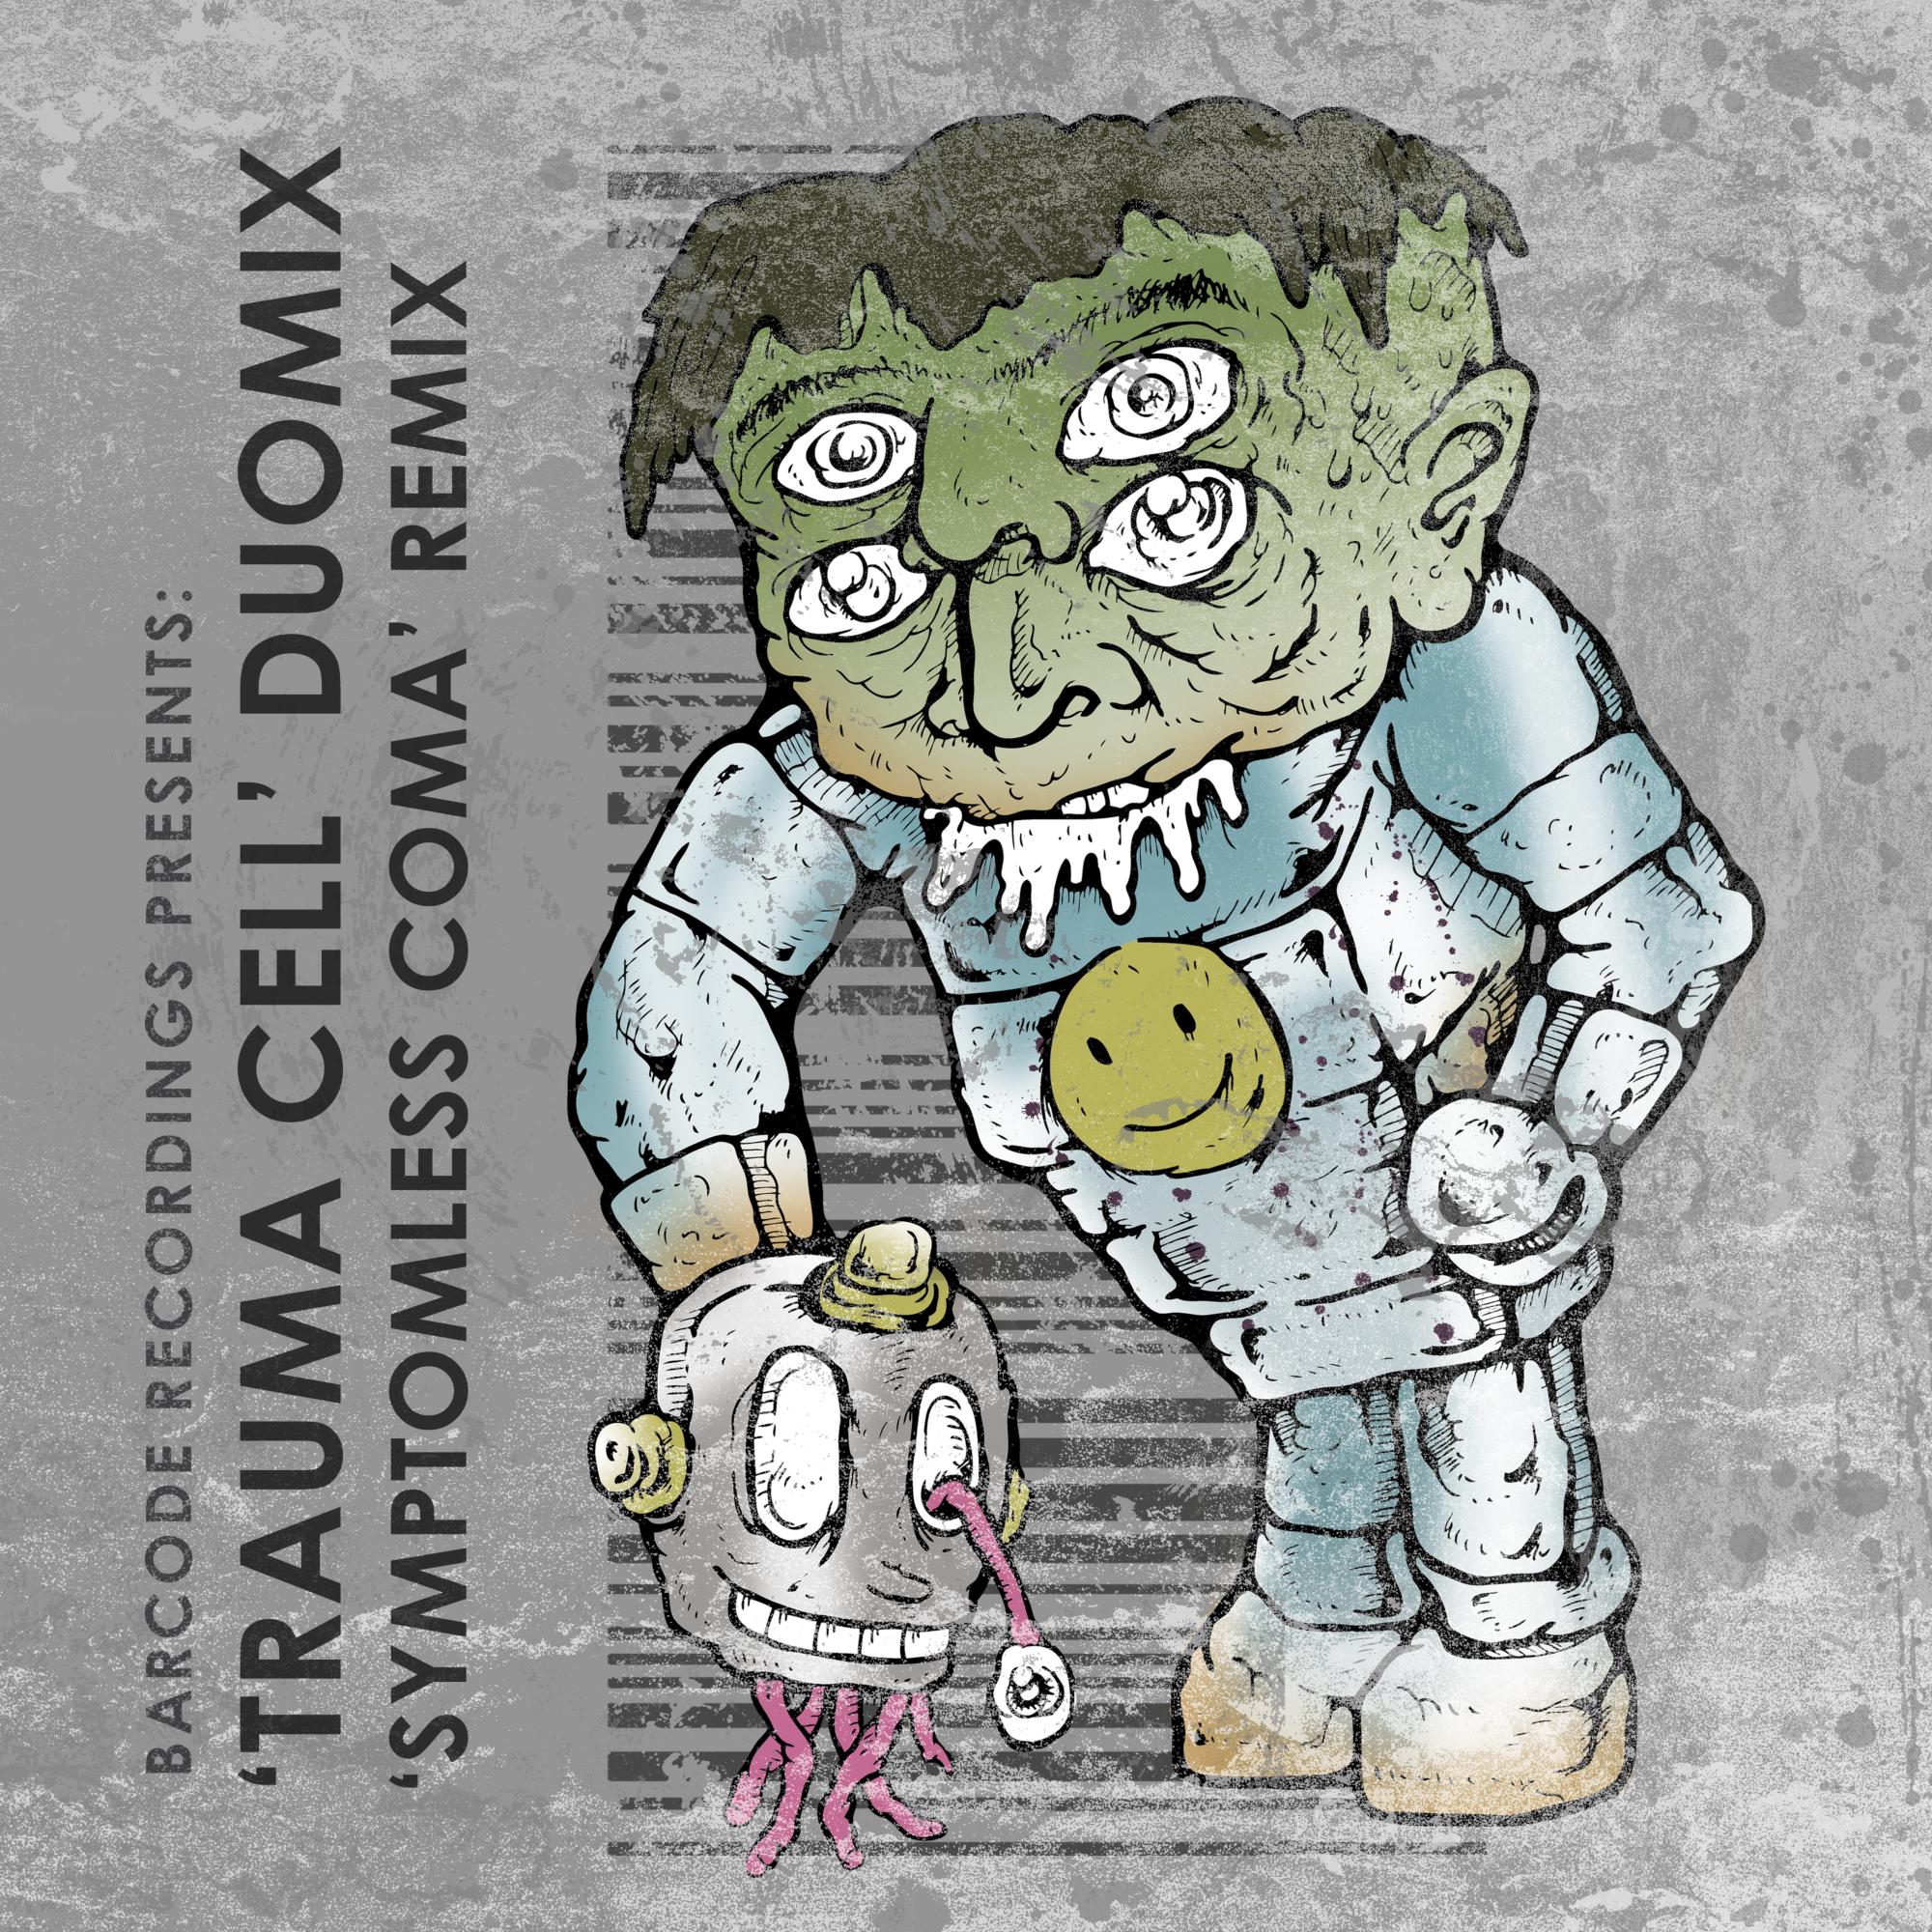 Various Artists - Trauma / Cell (Duomix / Symptomless Coma (Remix)